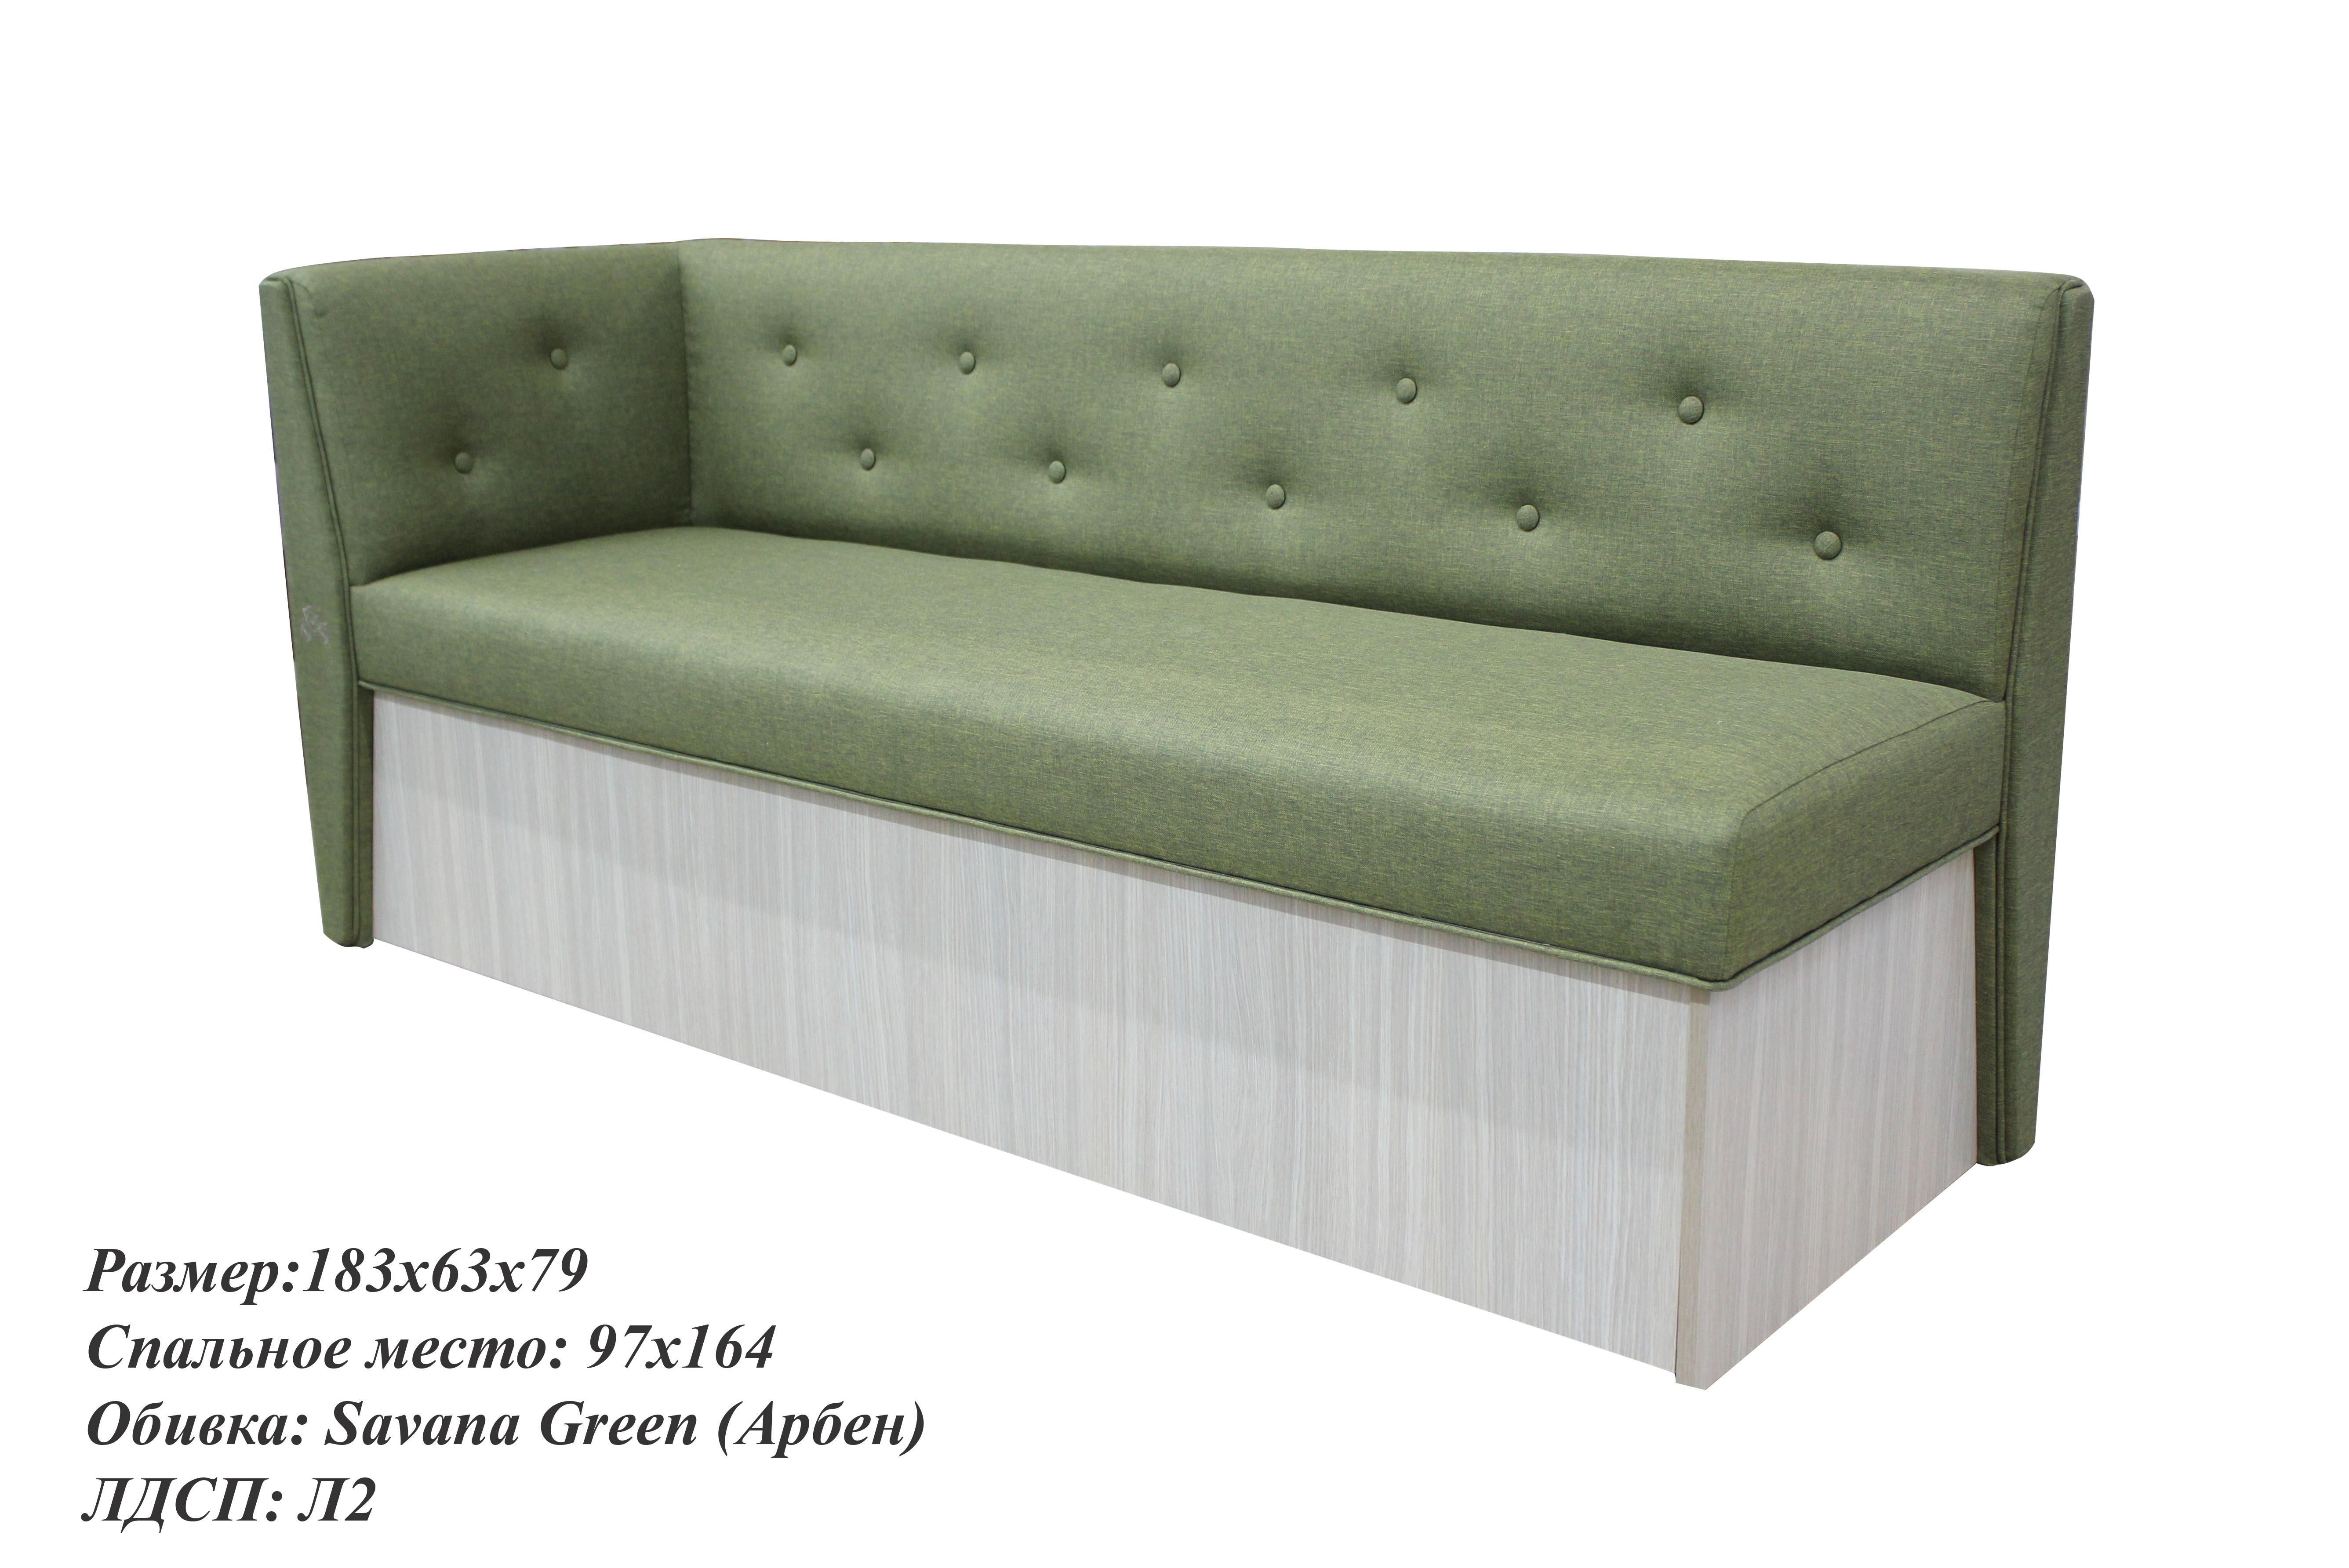 Кухонный диван Верона с углом - Savana фото